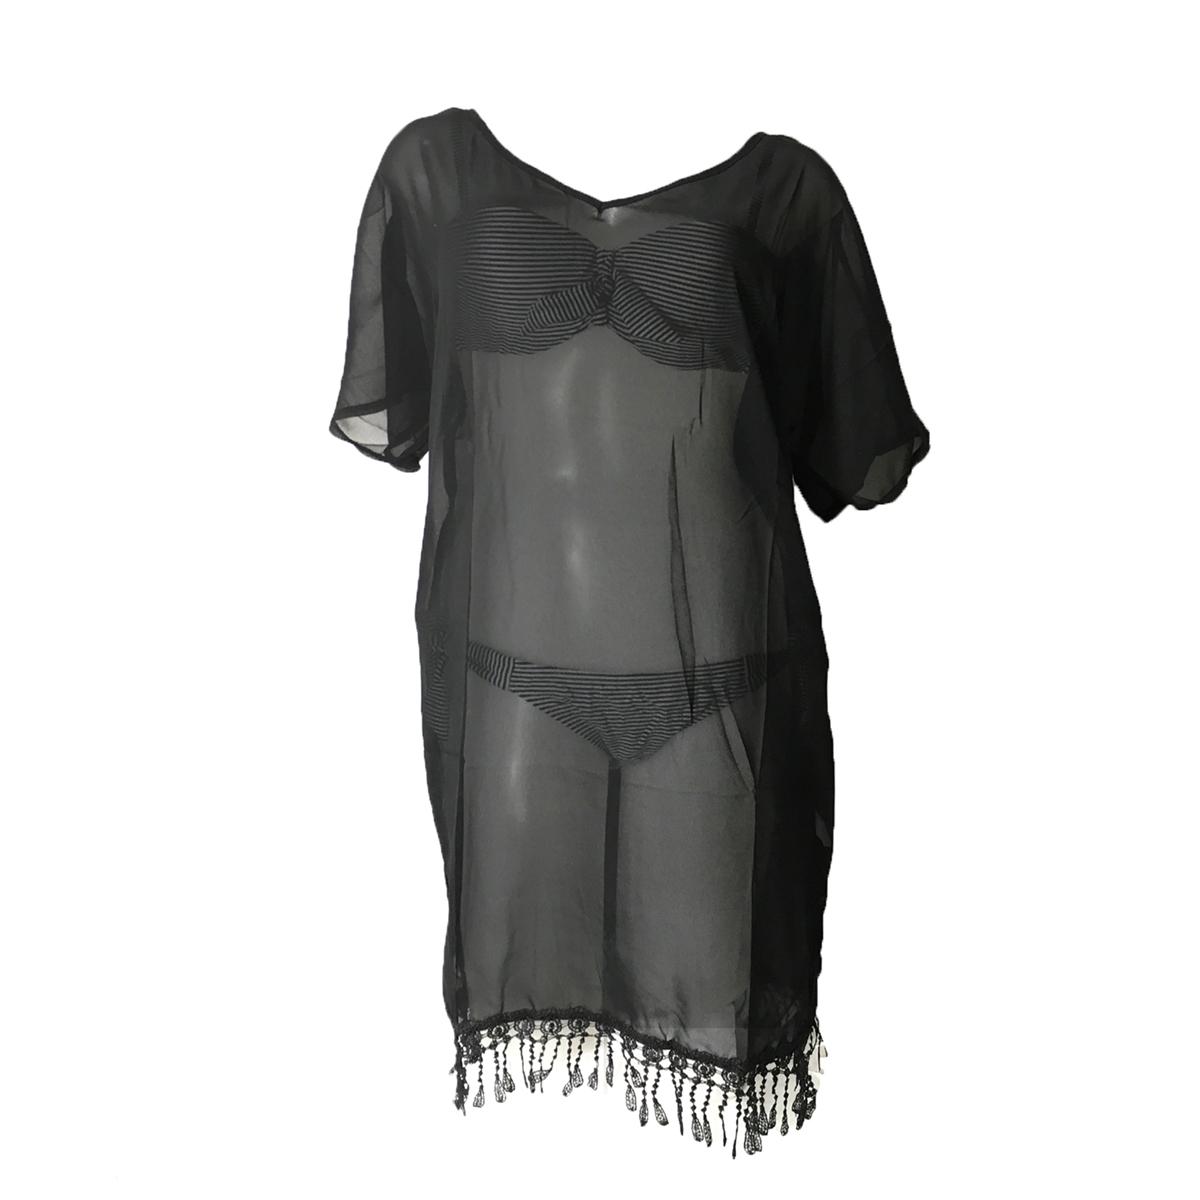 5c34b2523b Lace Fringe Trim Beach Tunic Swim Cover Up, Black